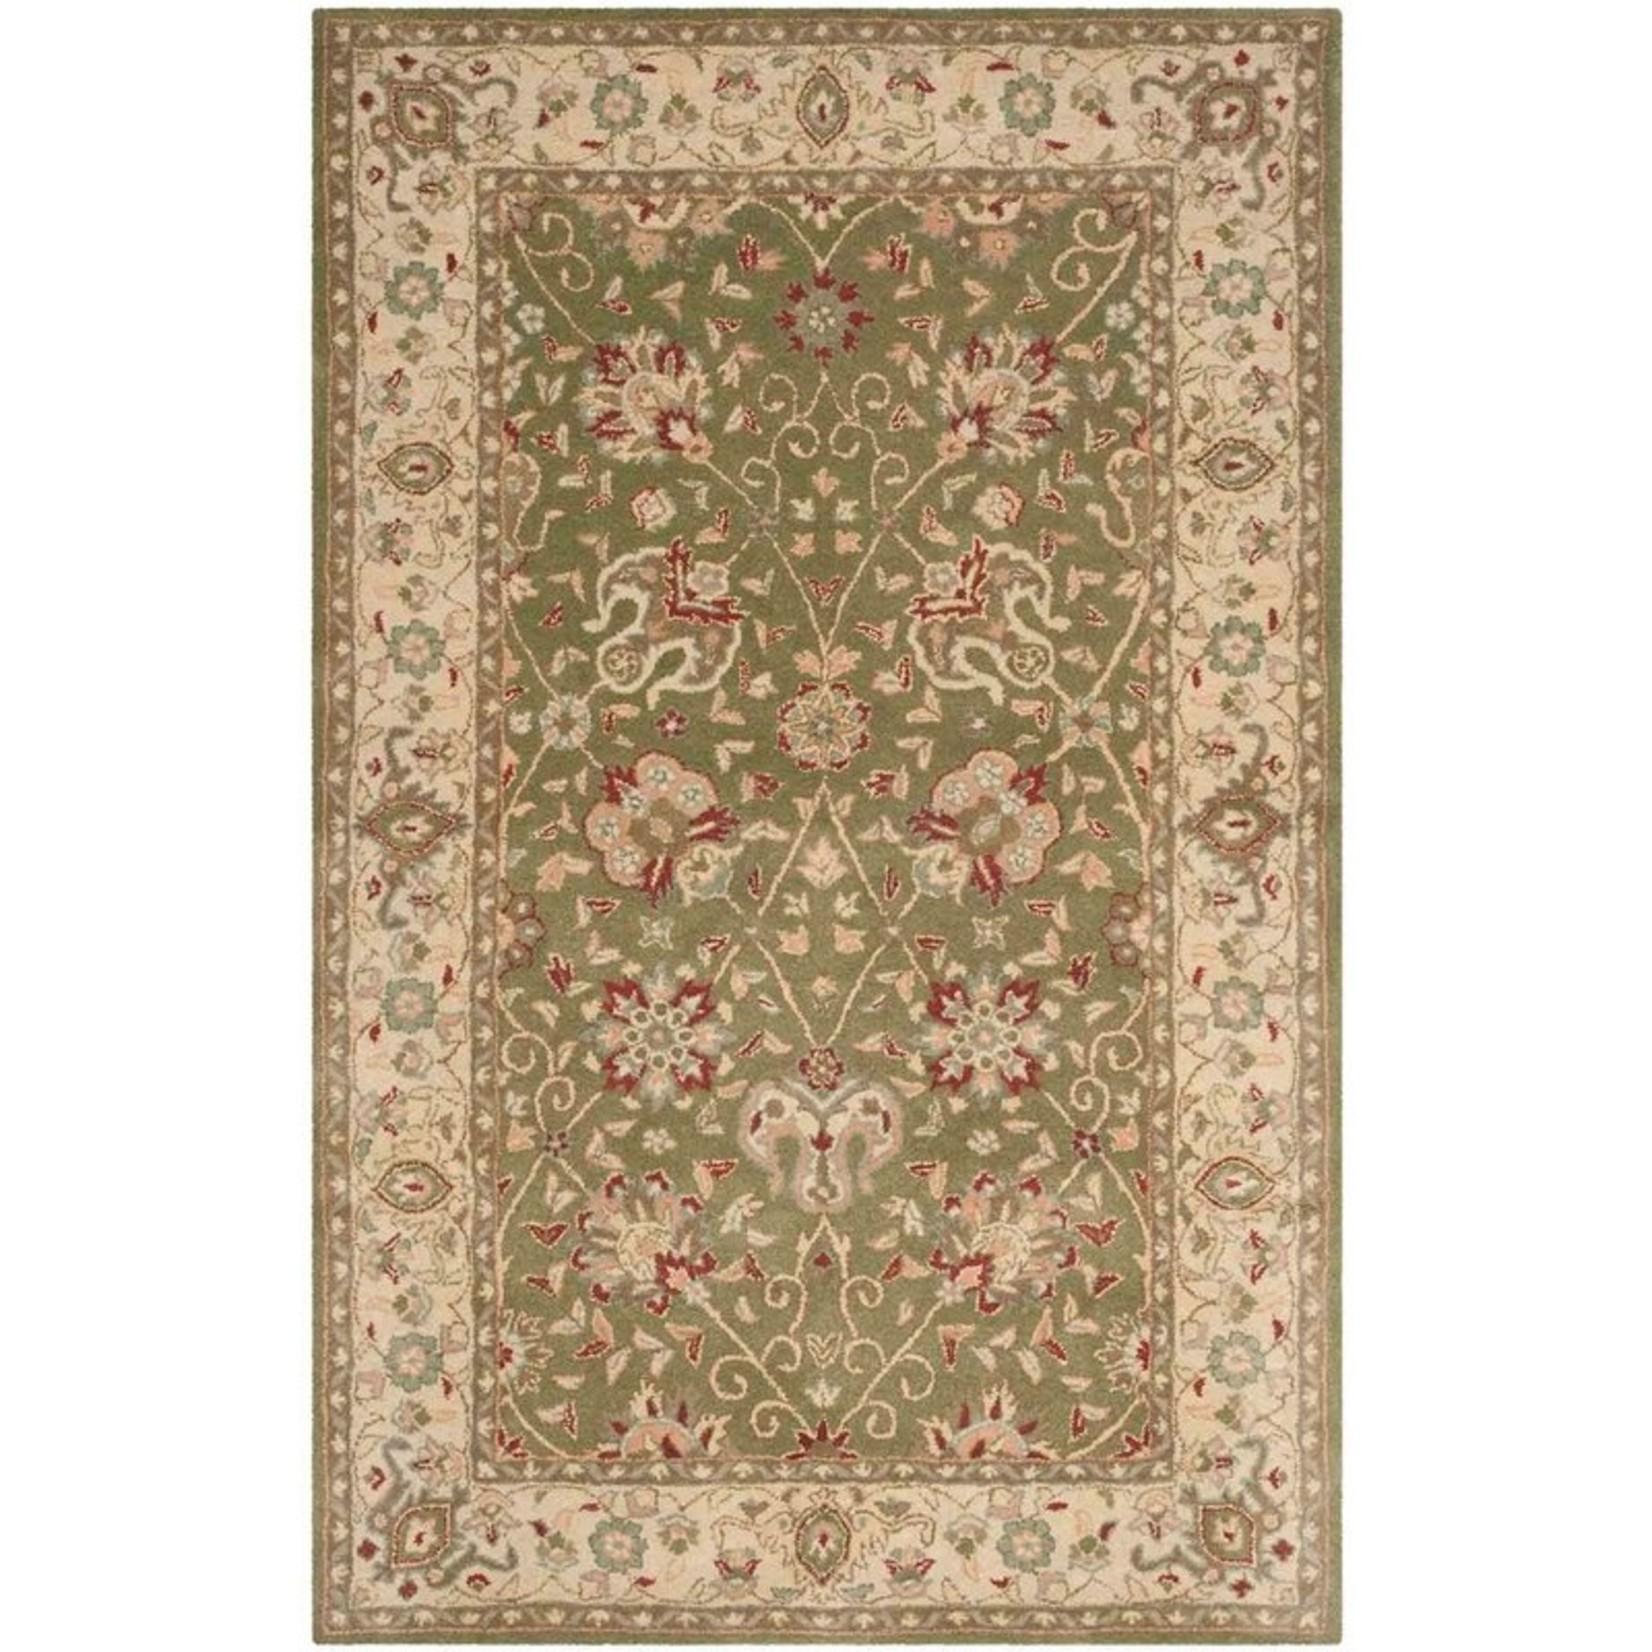 *2' x 3 - Dunbar Oriental Hand-Tufted Wool Ivory/Light Green Area Rug